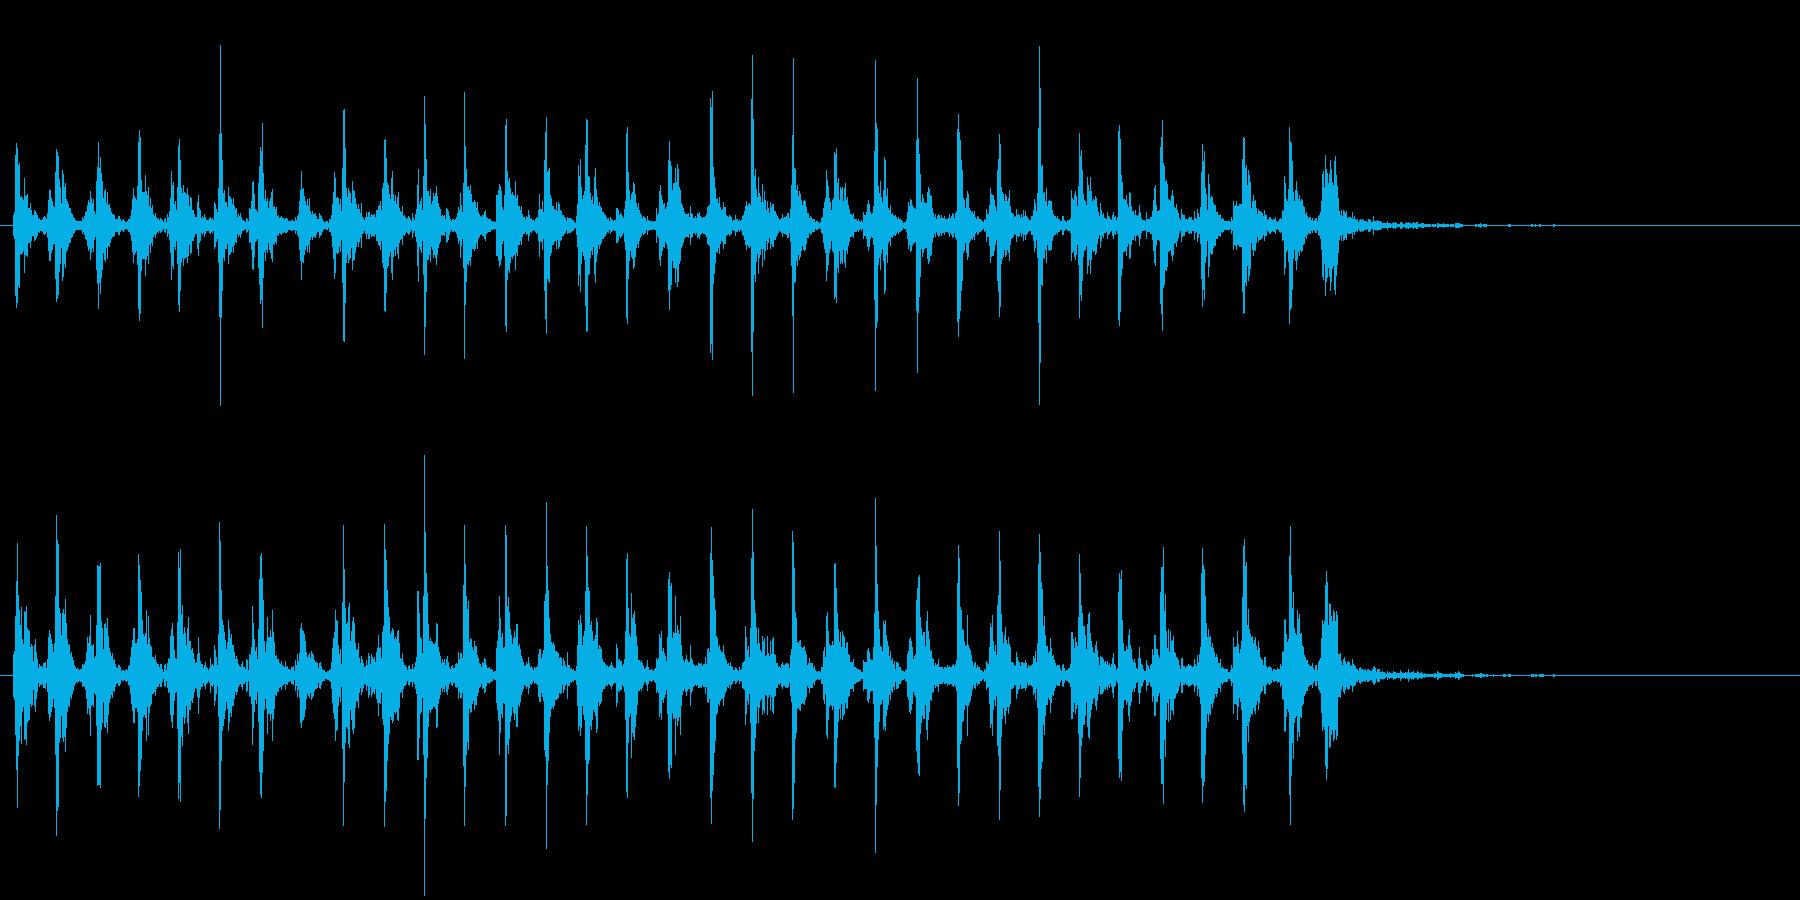 Xmasに最適トナカイベルのループ音03の再生済みの波形